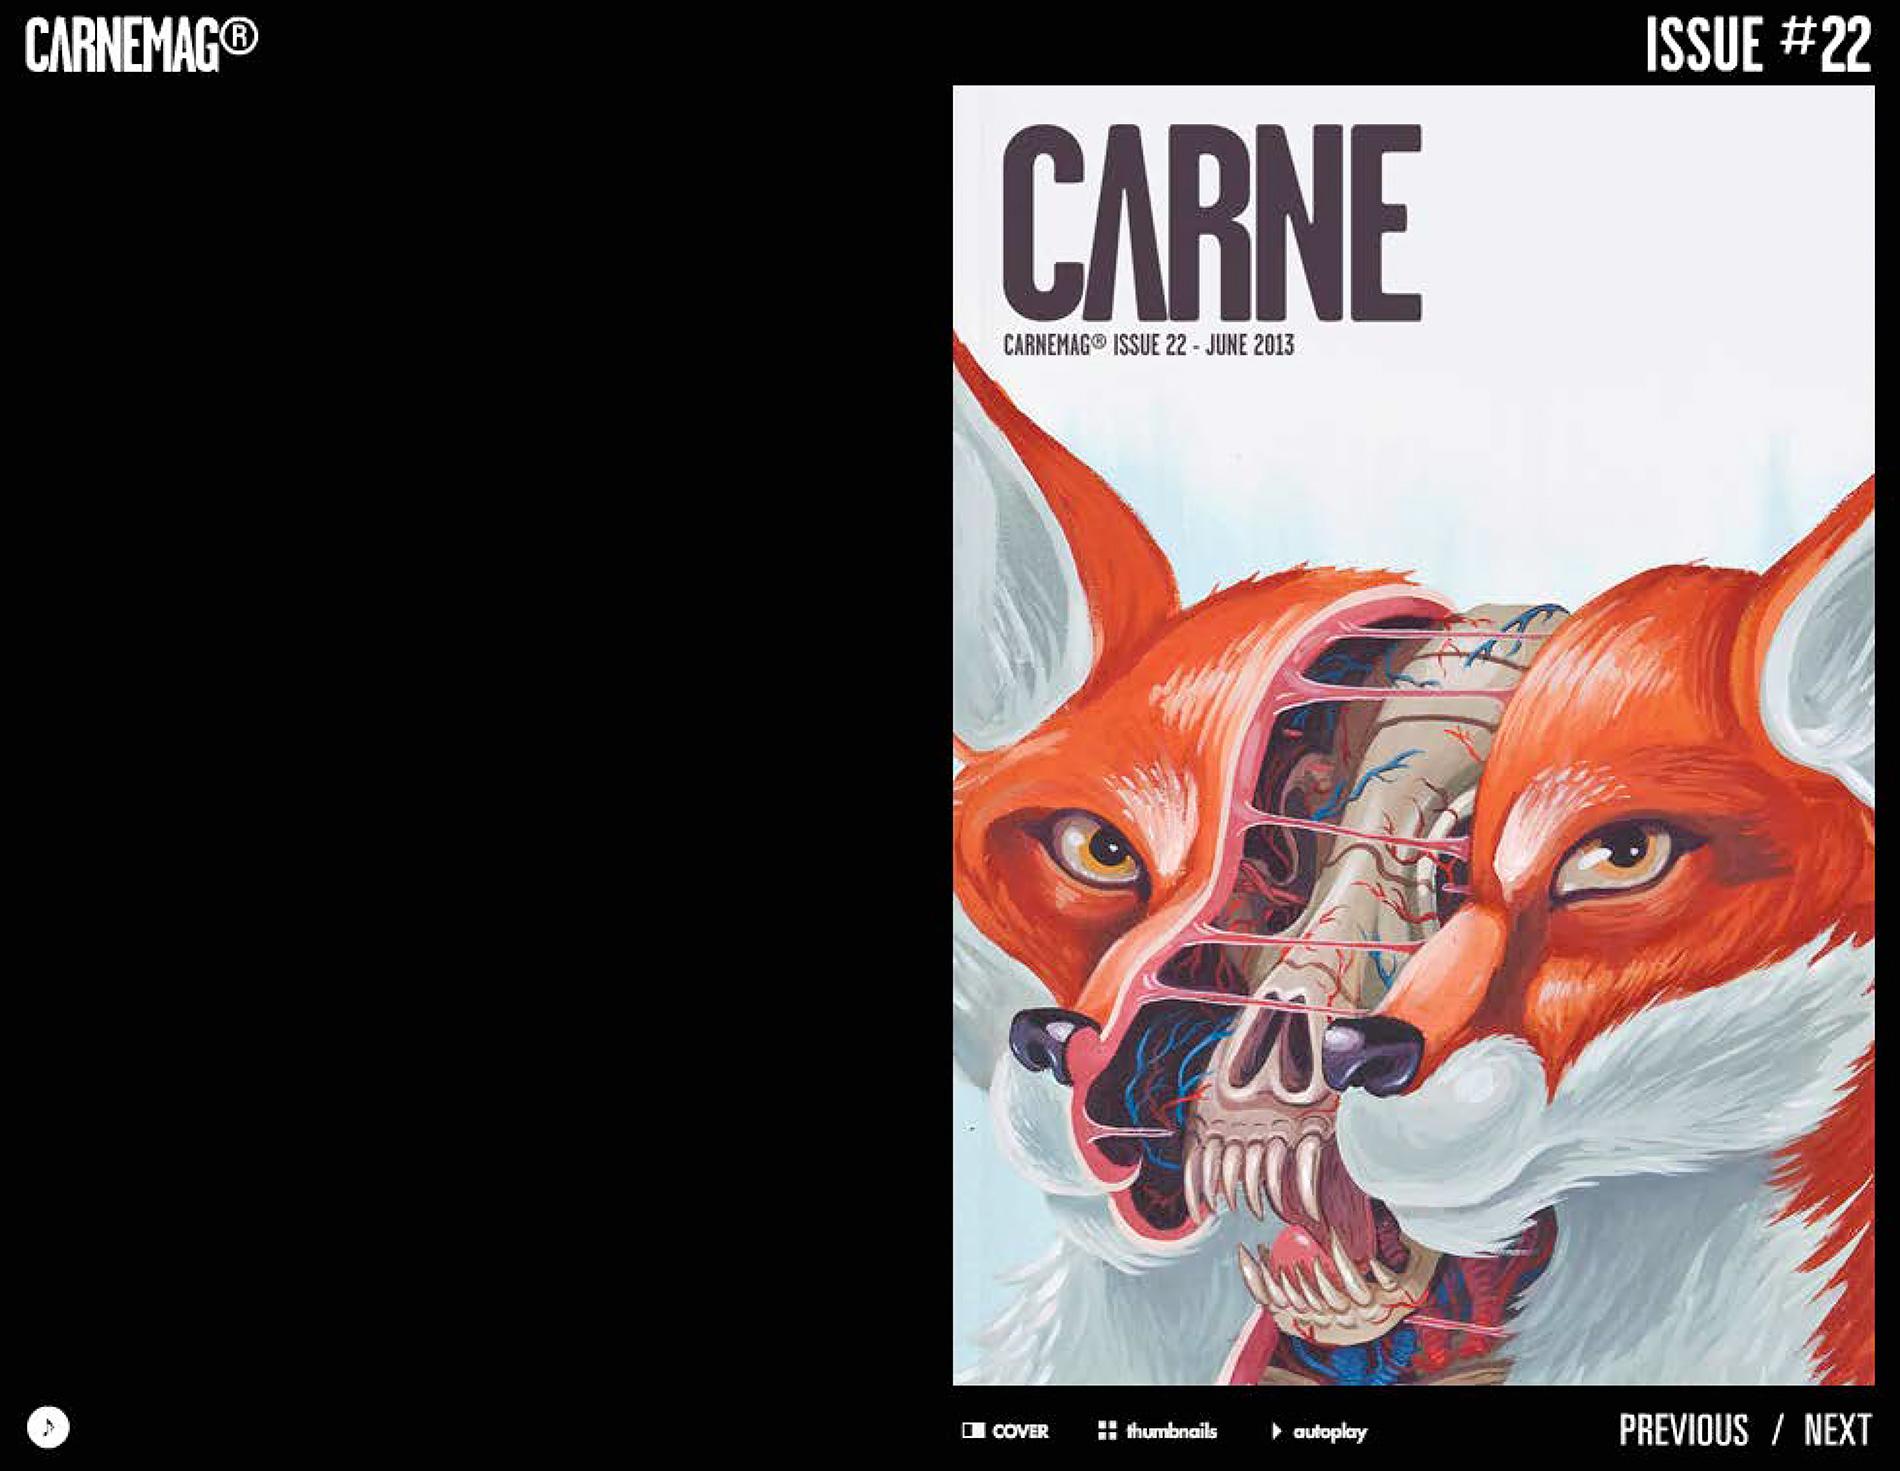 SD_CarneMag-Issue22-1.jpg